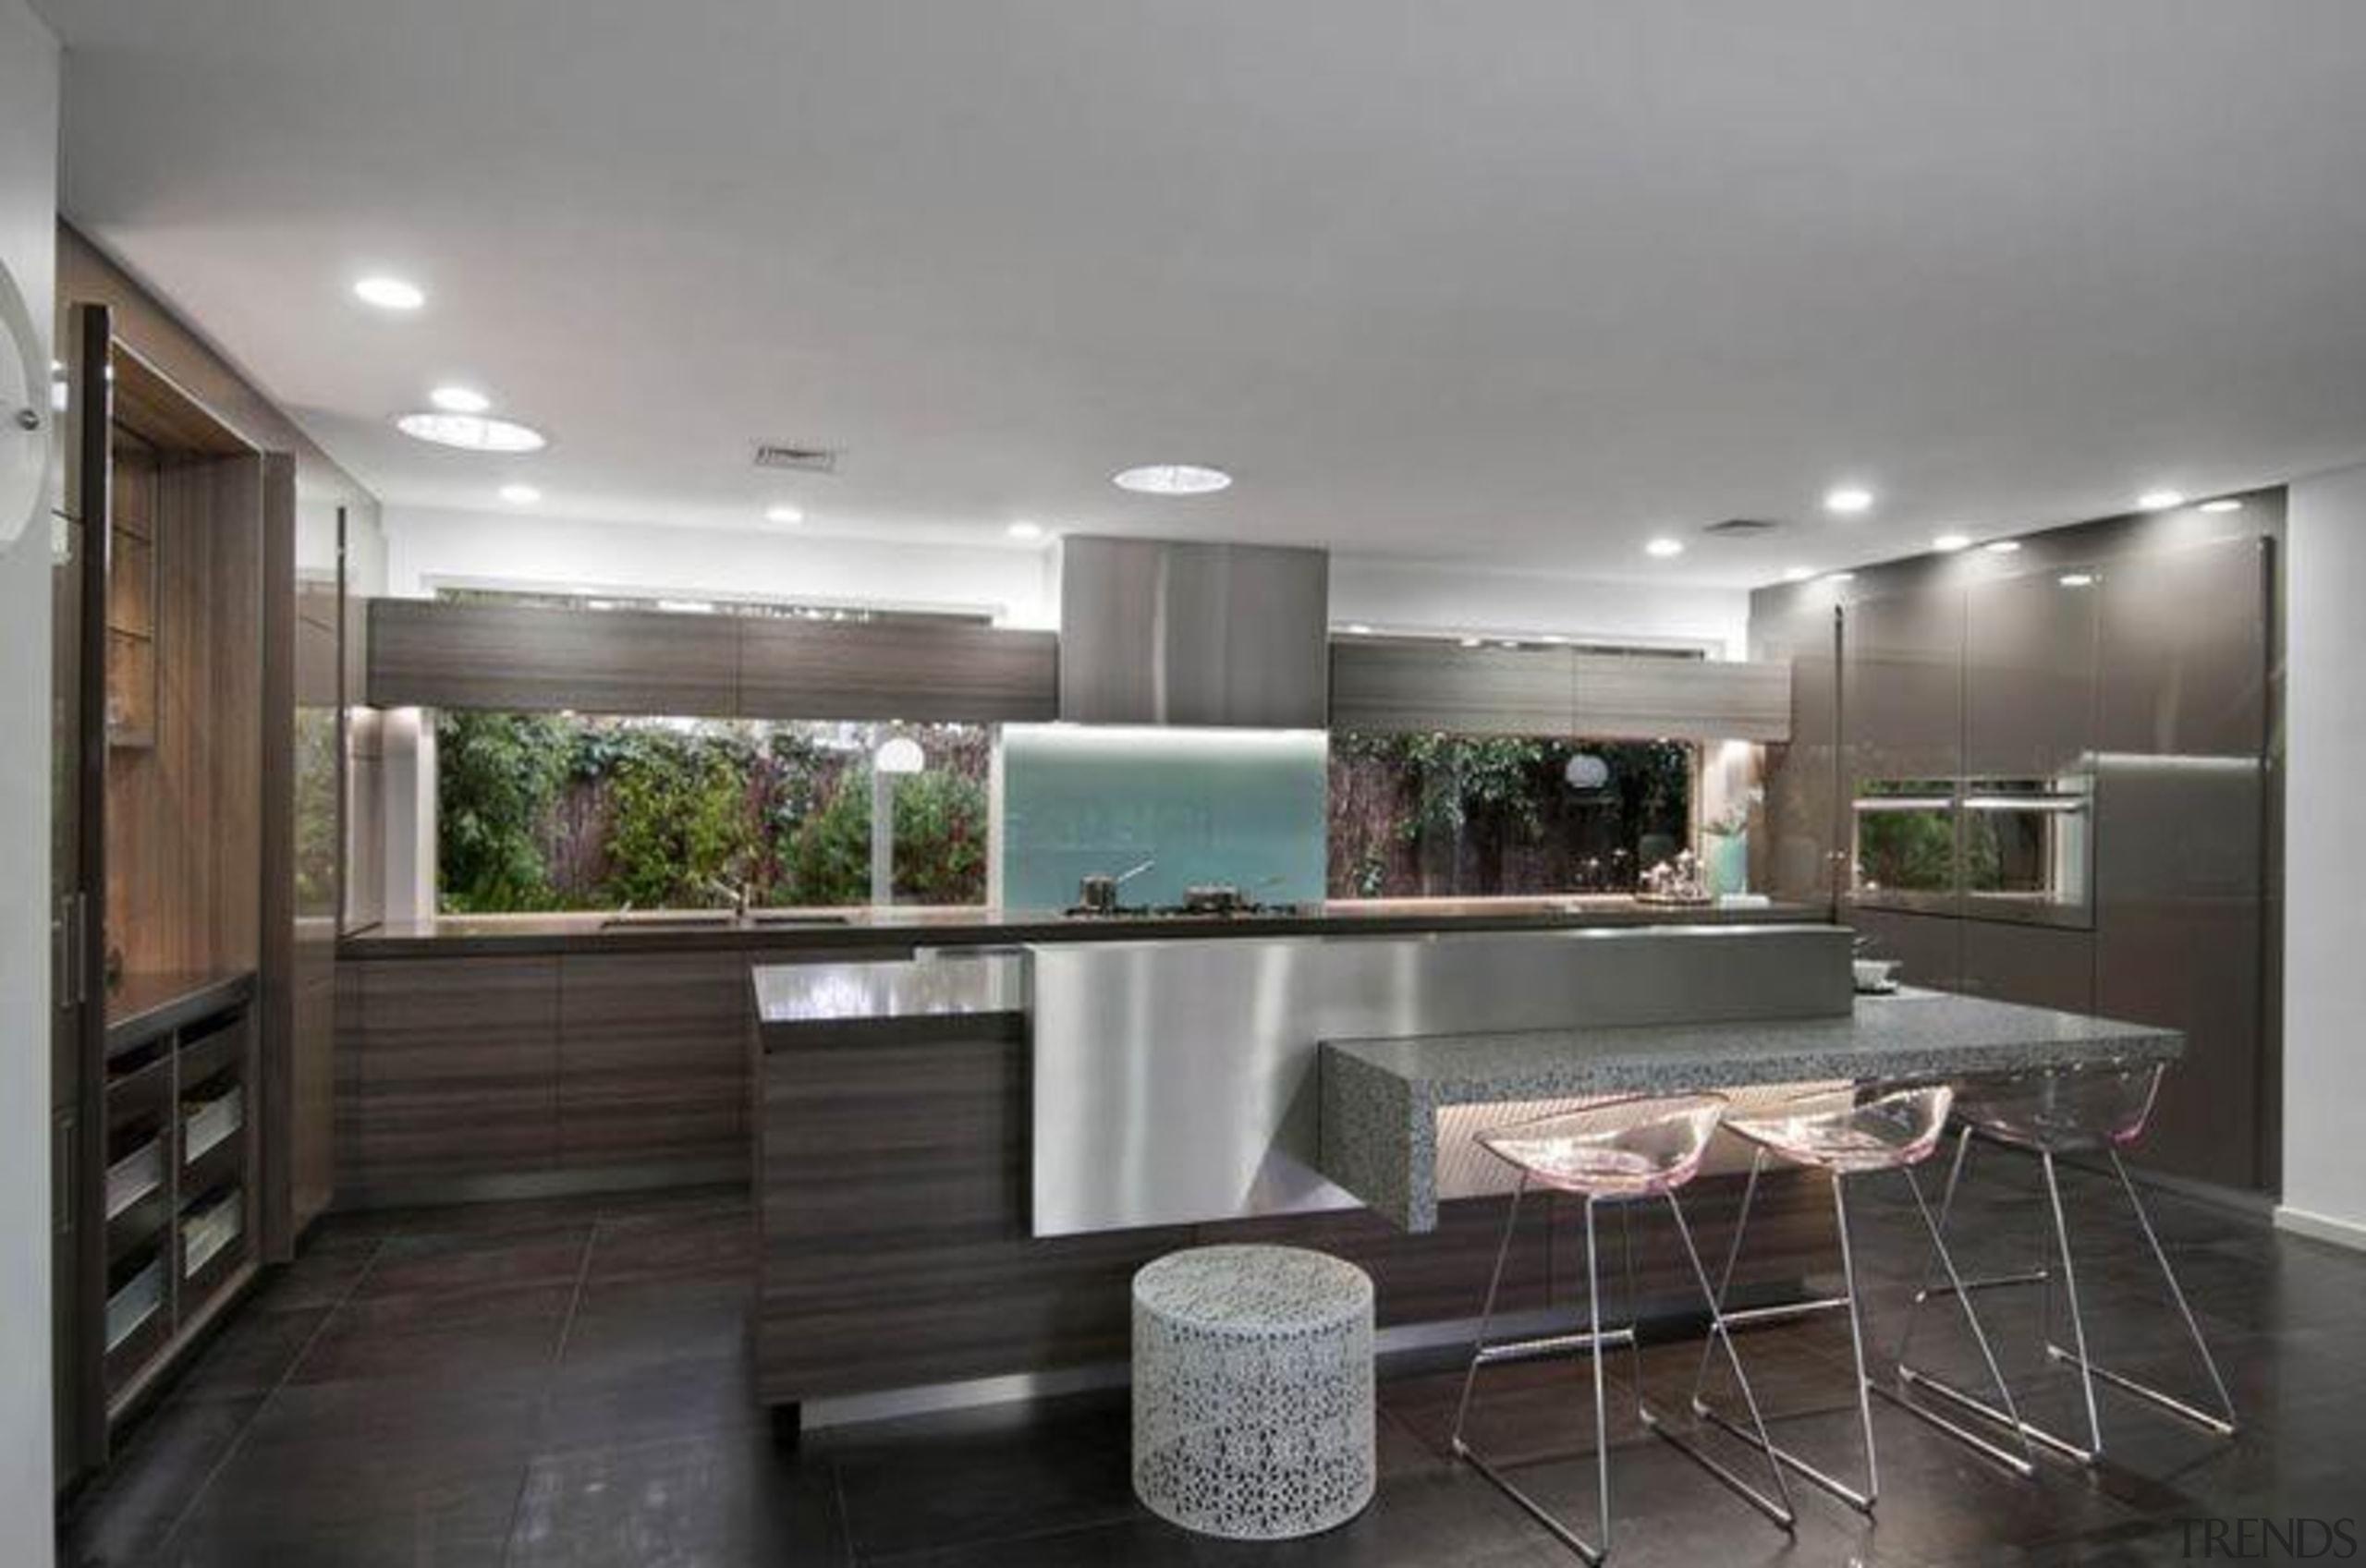 Orana Designer Kitchens Mosaici Carbone - Mosaici Carbone™ countertop, house, interior design, kitchen, real estate, gray, black